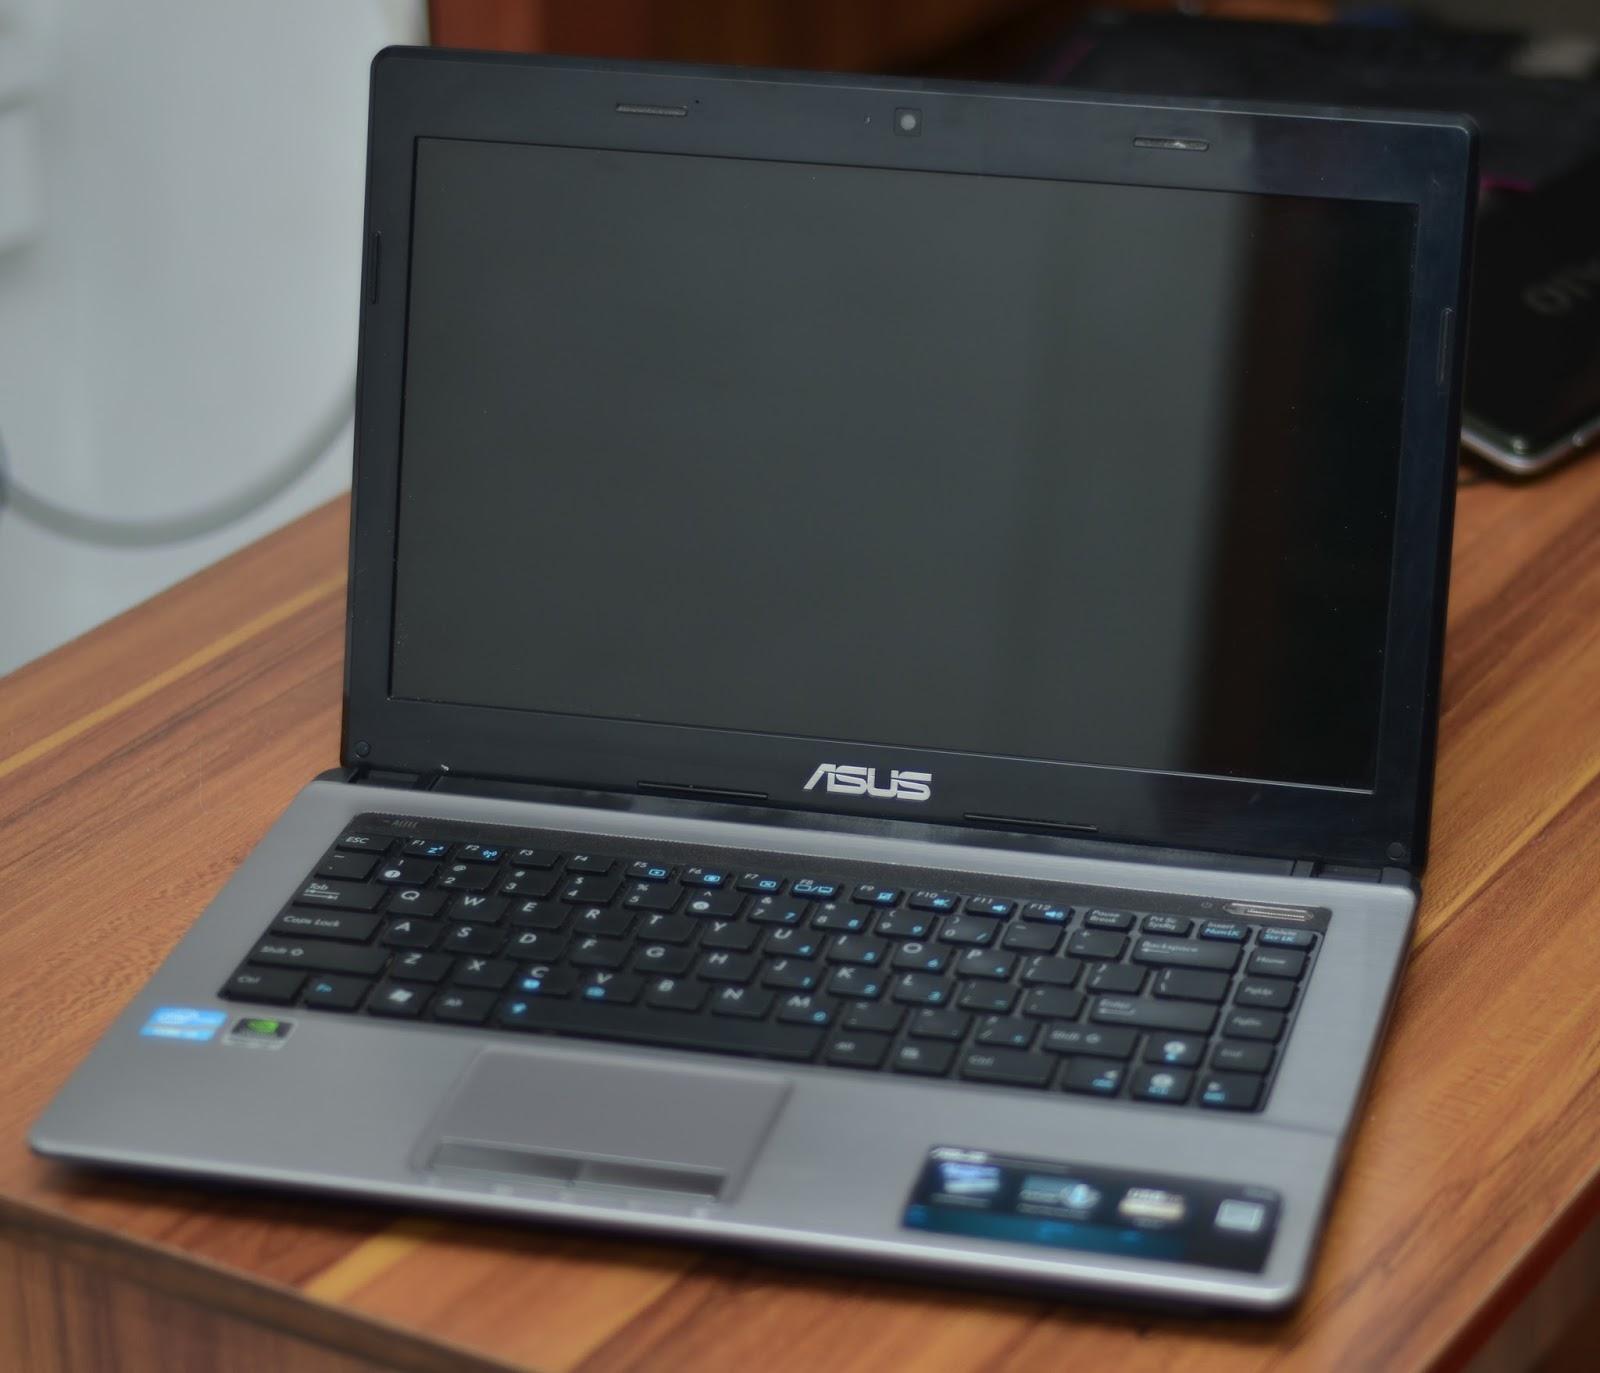 Jual Laptop Gaming ASUS A43S I3 SandyBridge